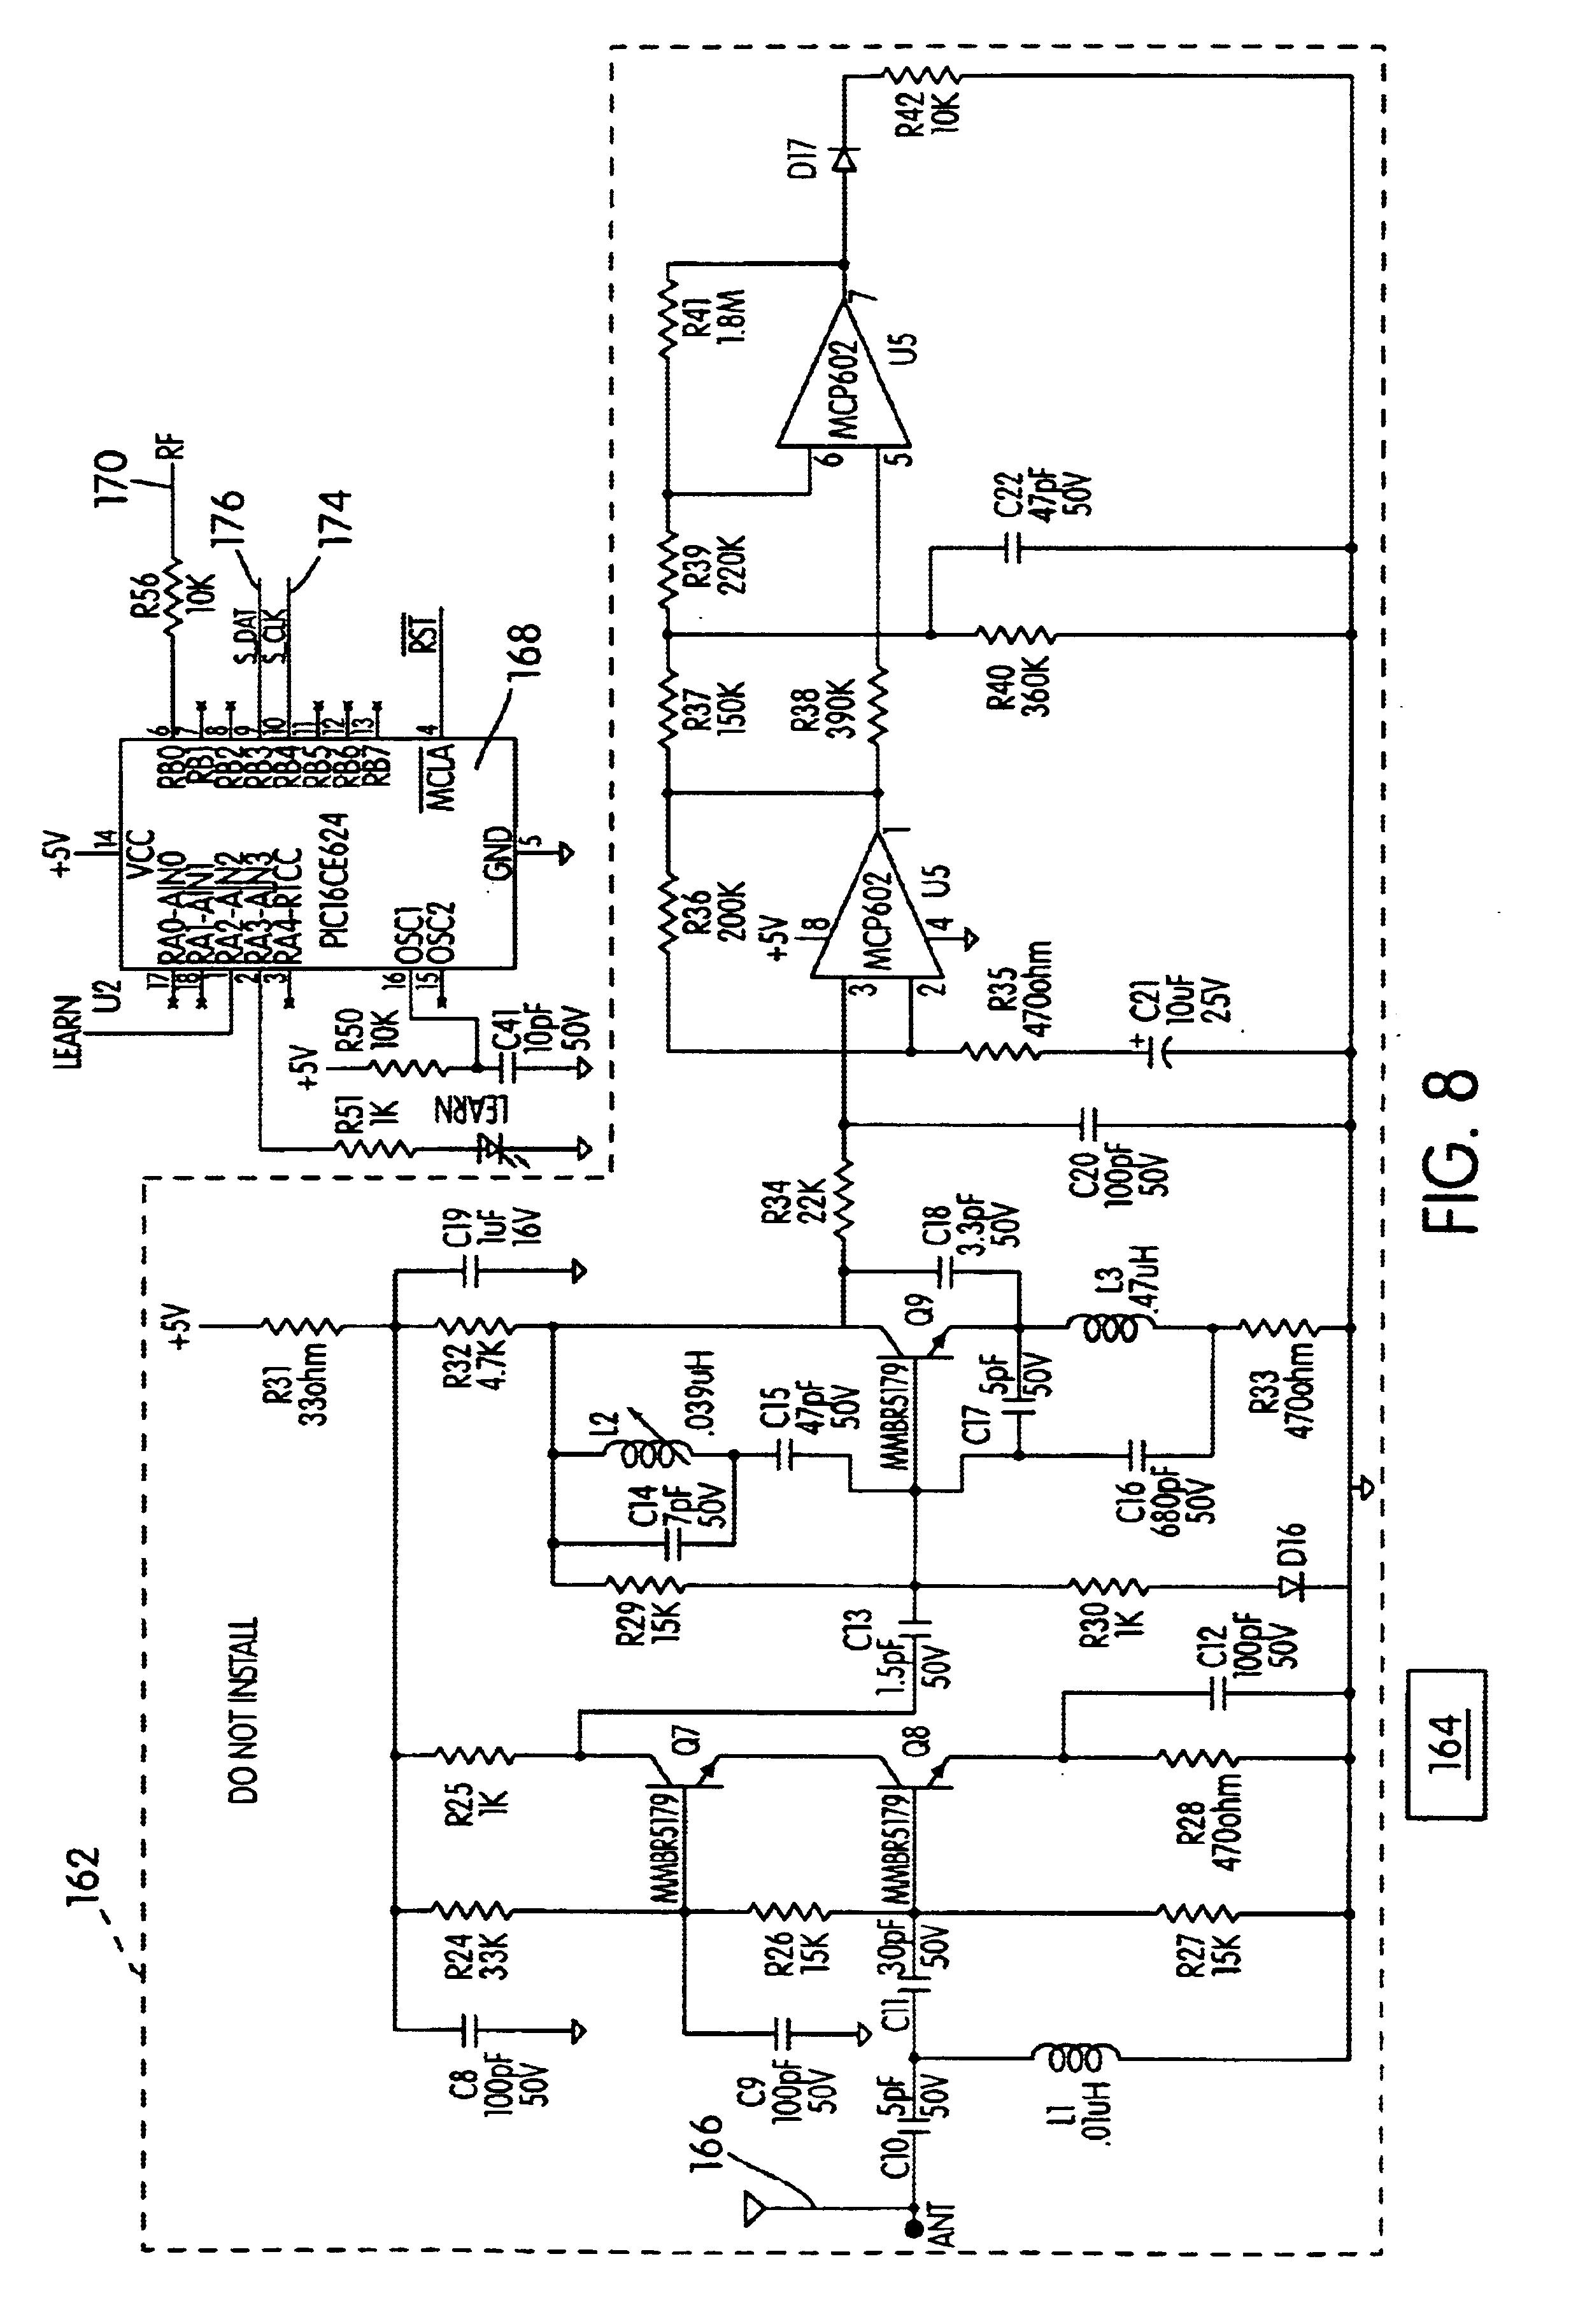 US06751909 20040622 D00007 patent us6751909 automatic door control system google patents dorma es200 wiring diagram at reclaimingppi.co